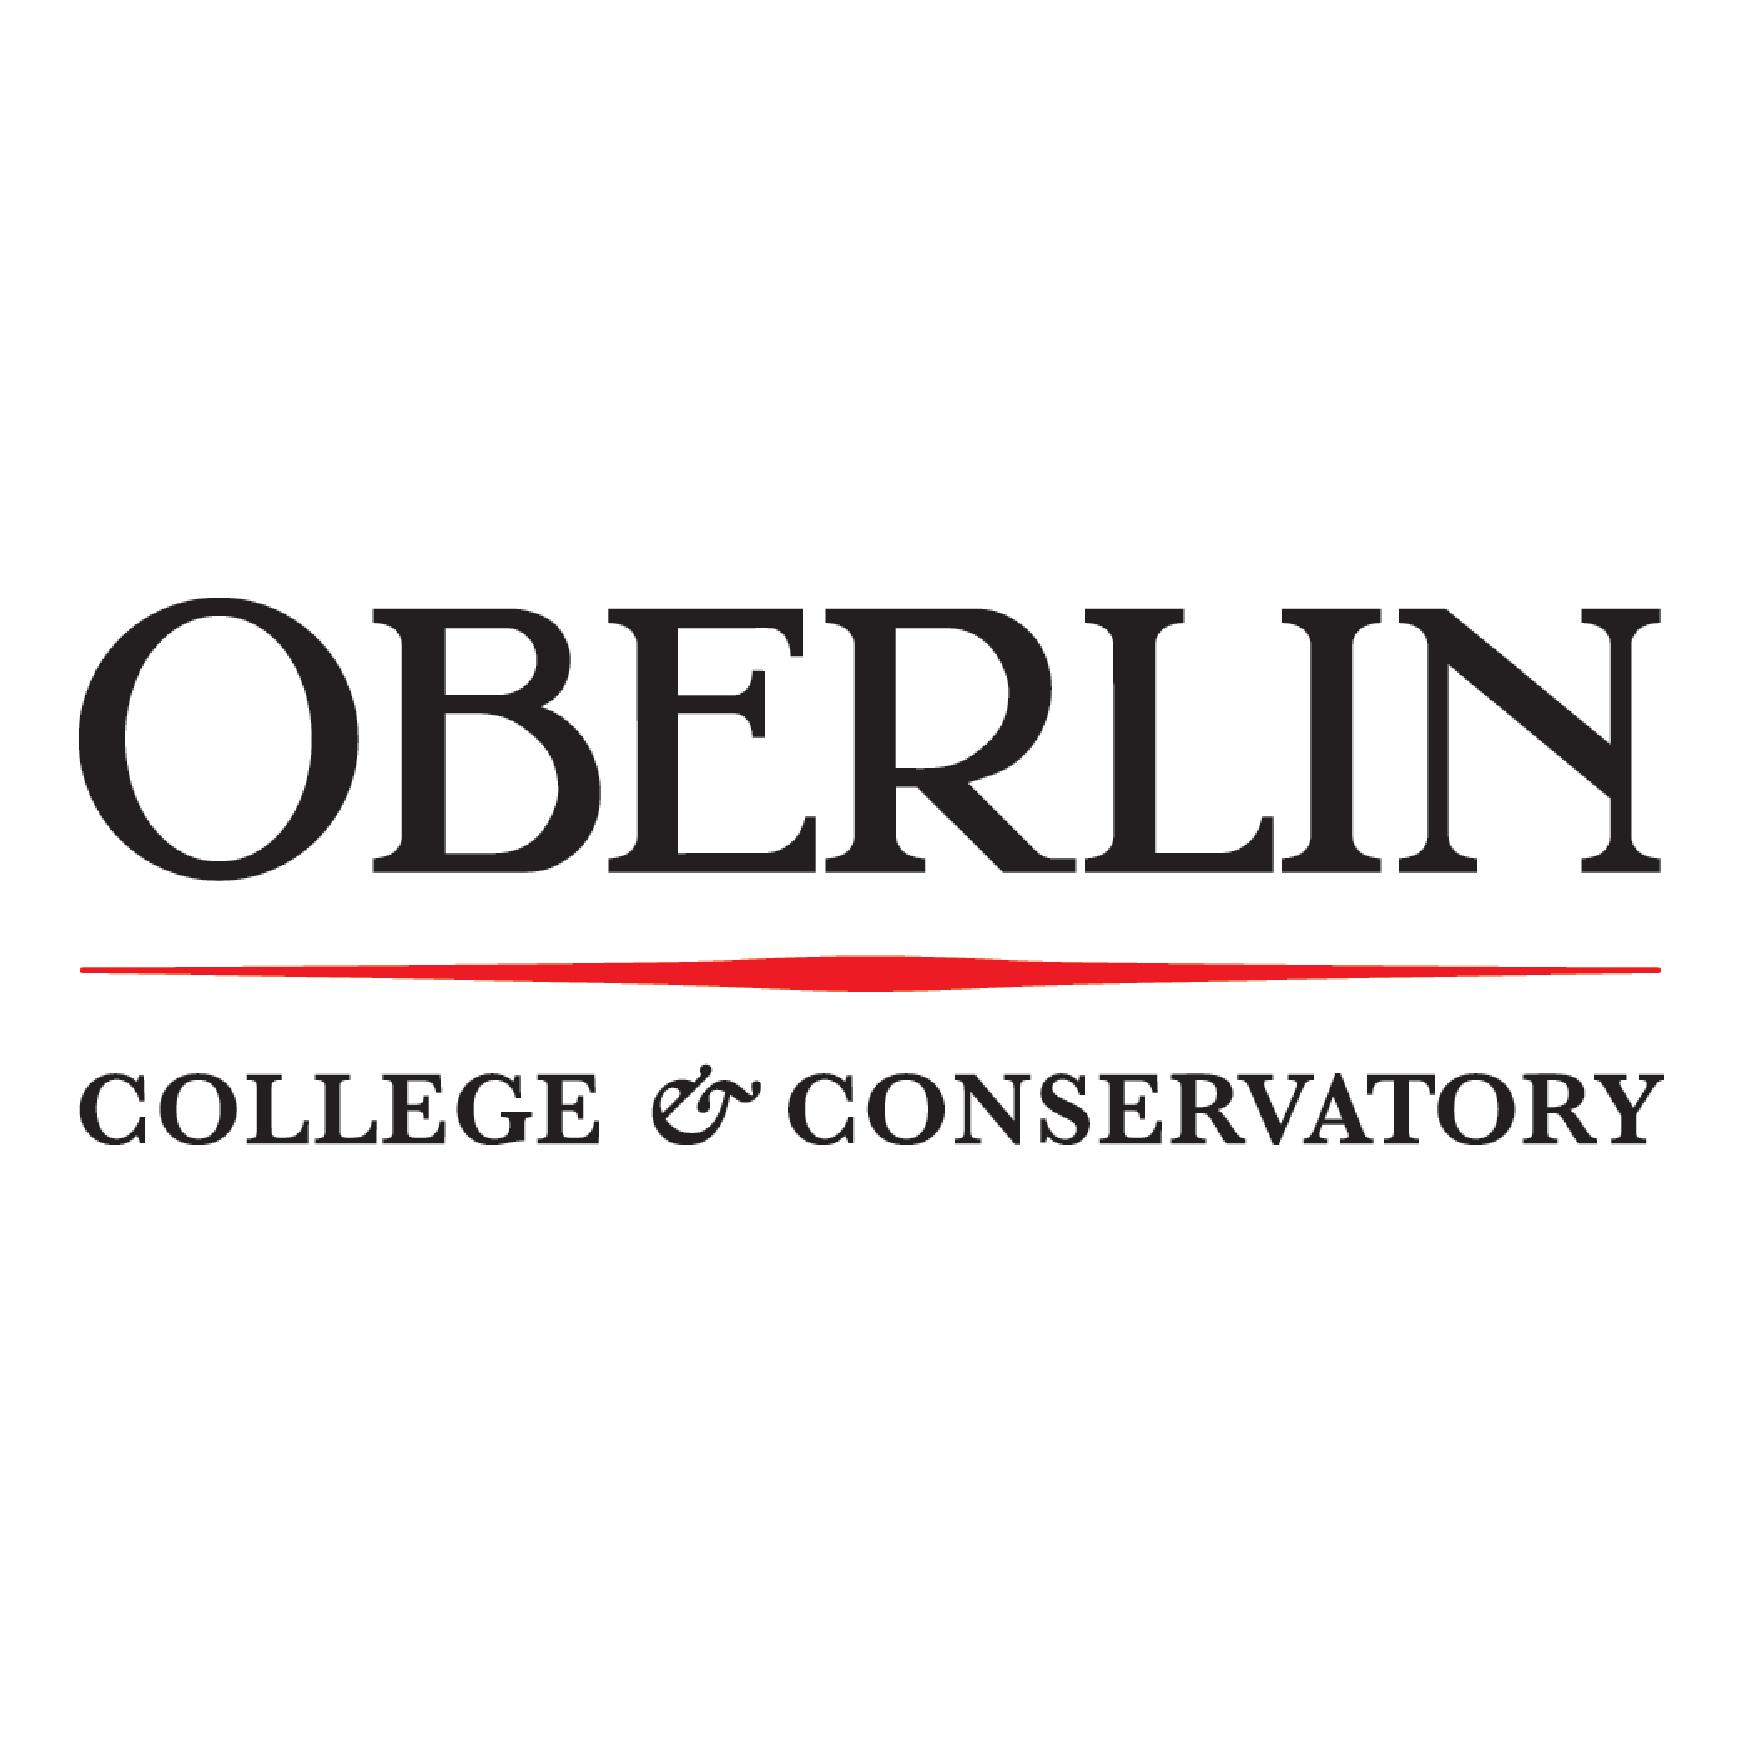 oberlin_logo.png